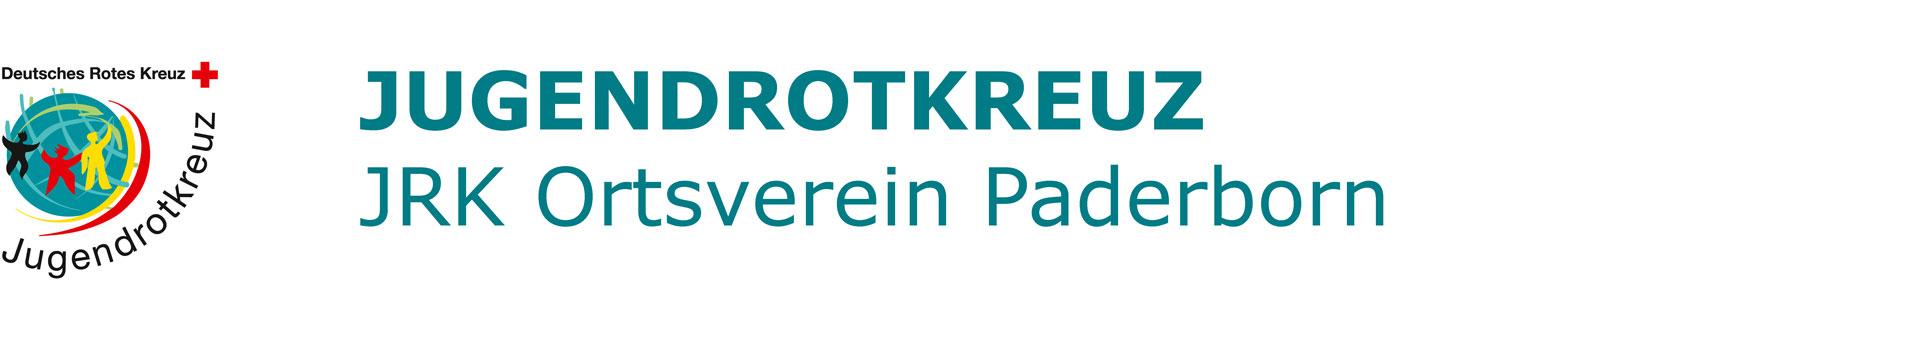 JRK Ortsverein Paderborn